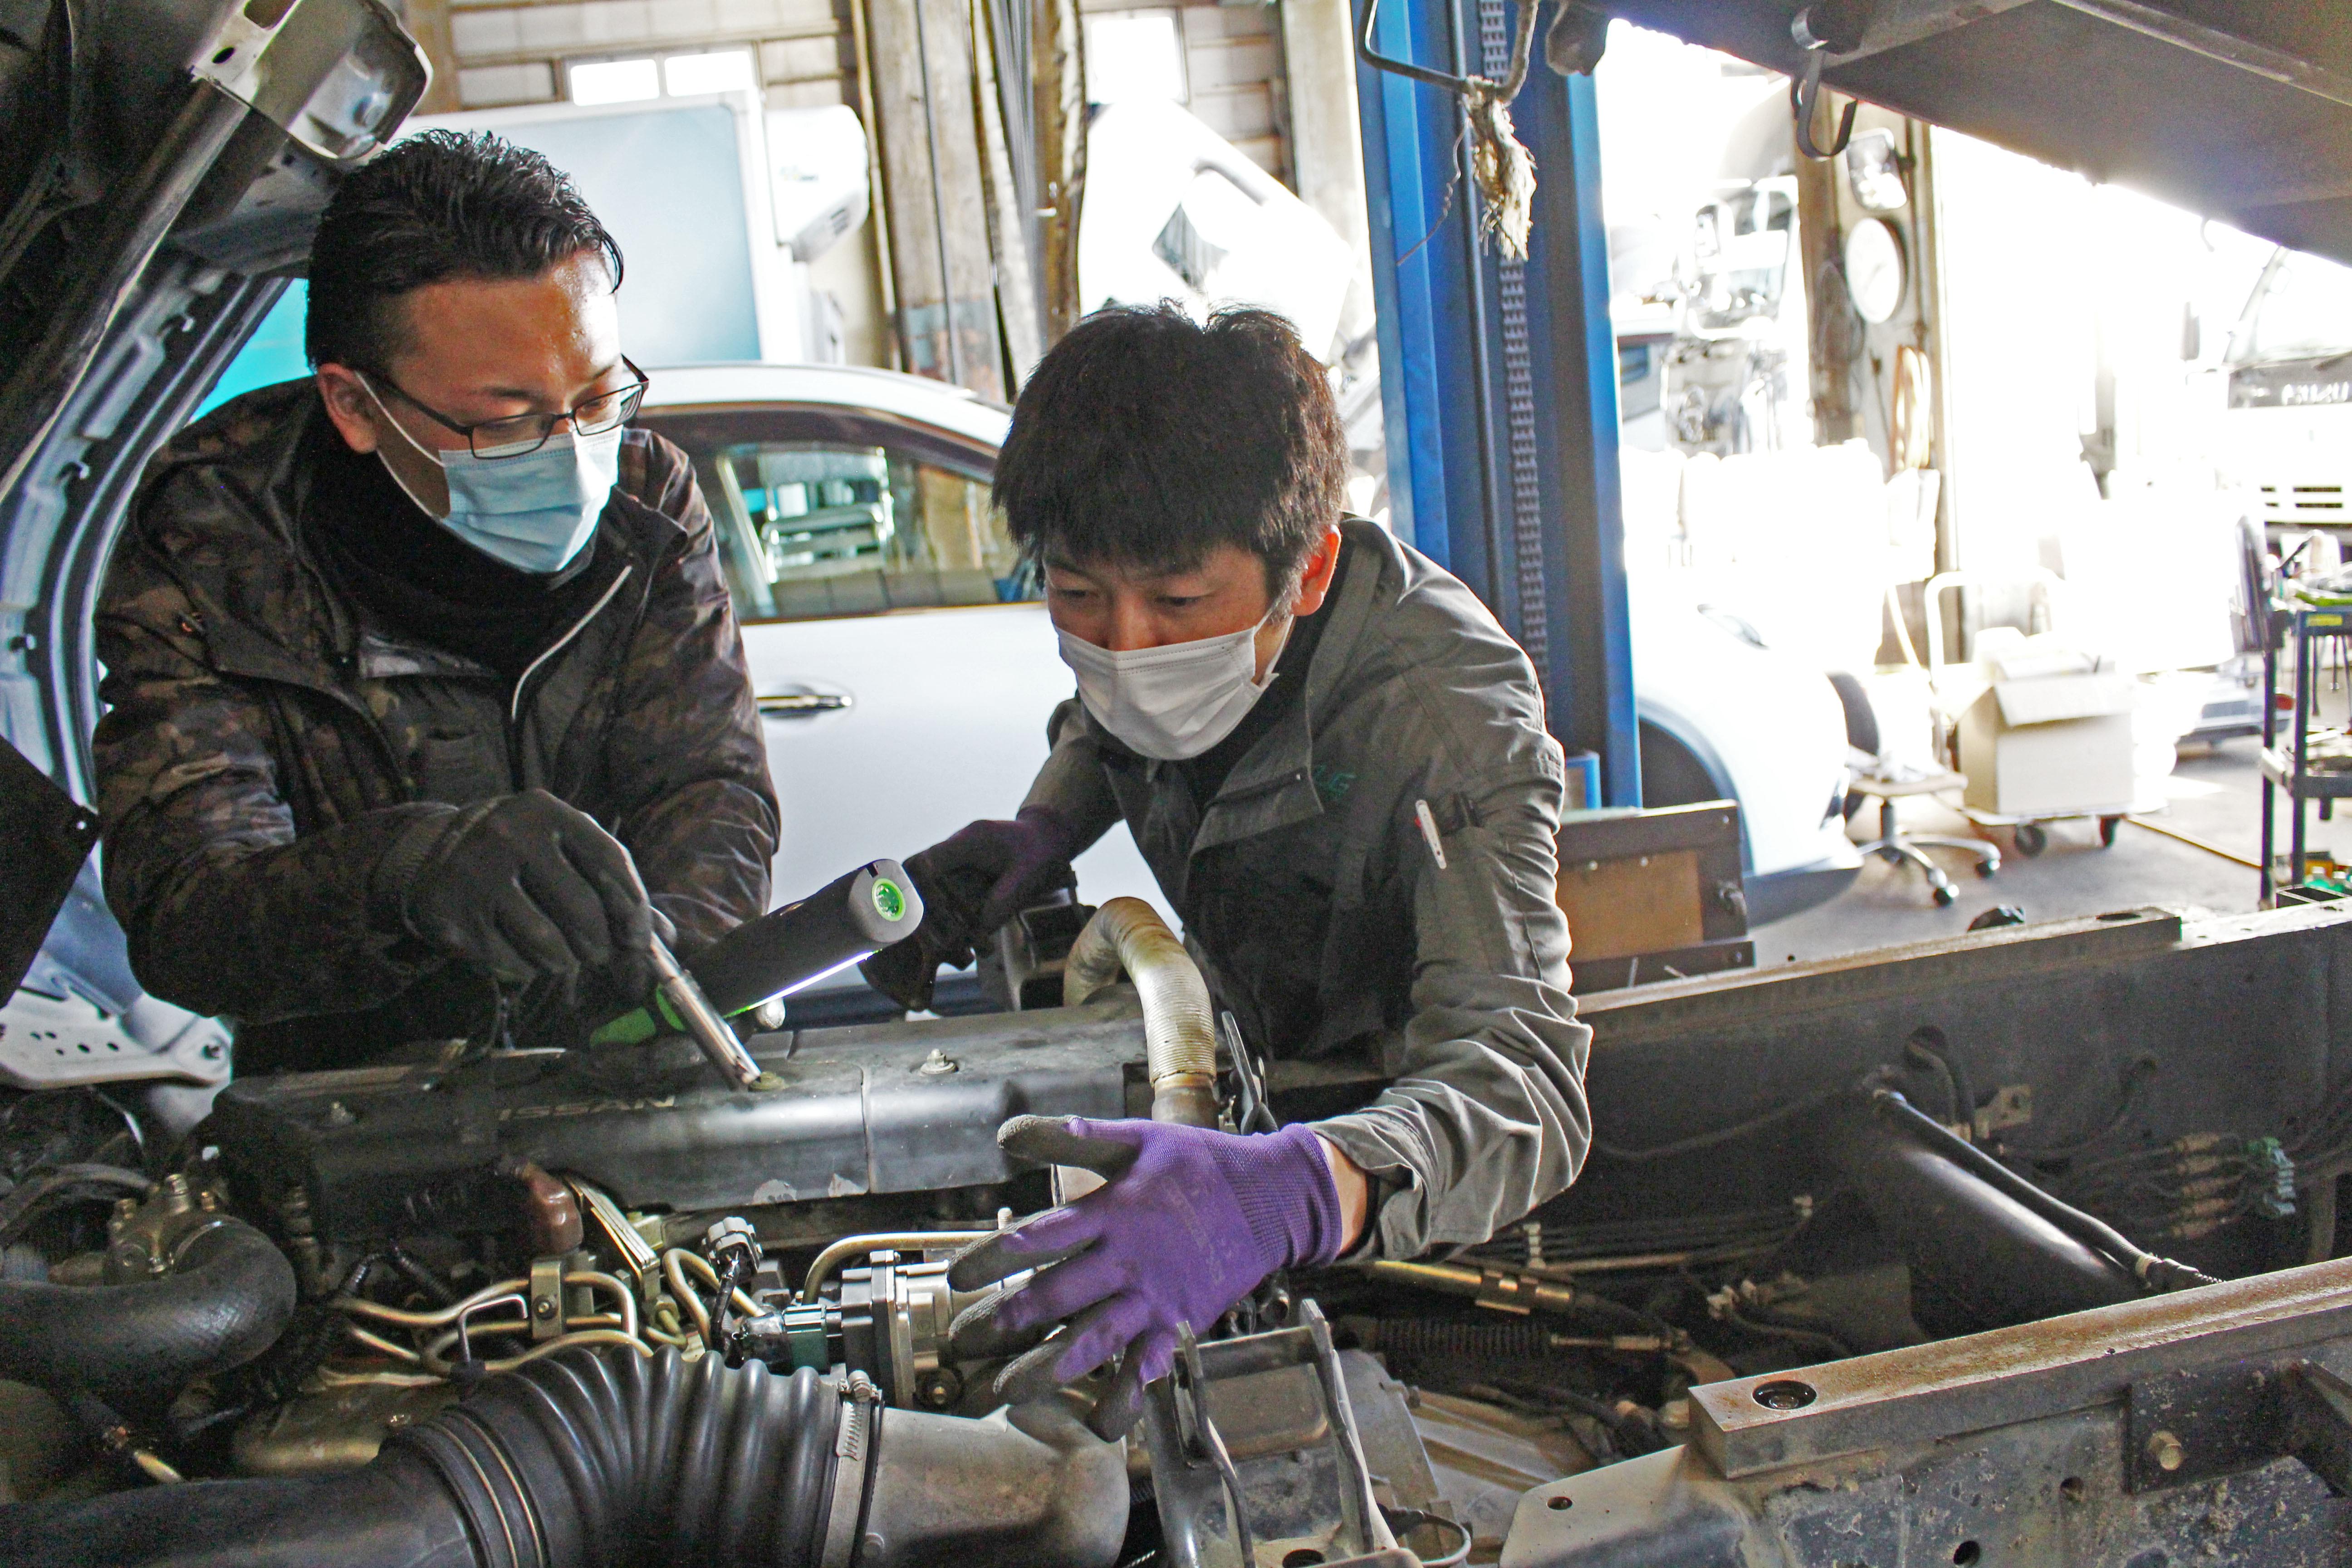 【Saitama. Fujimi】No experience needed!Looking for auto technician!